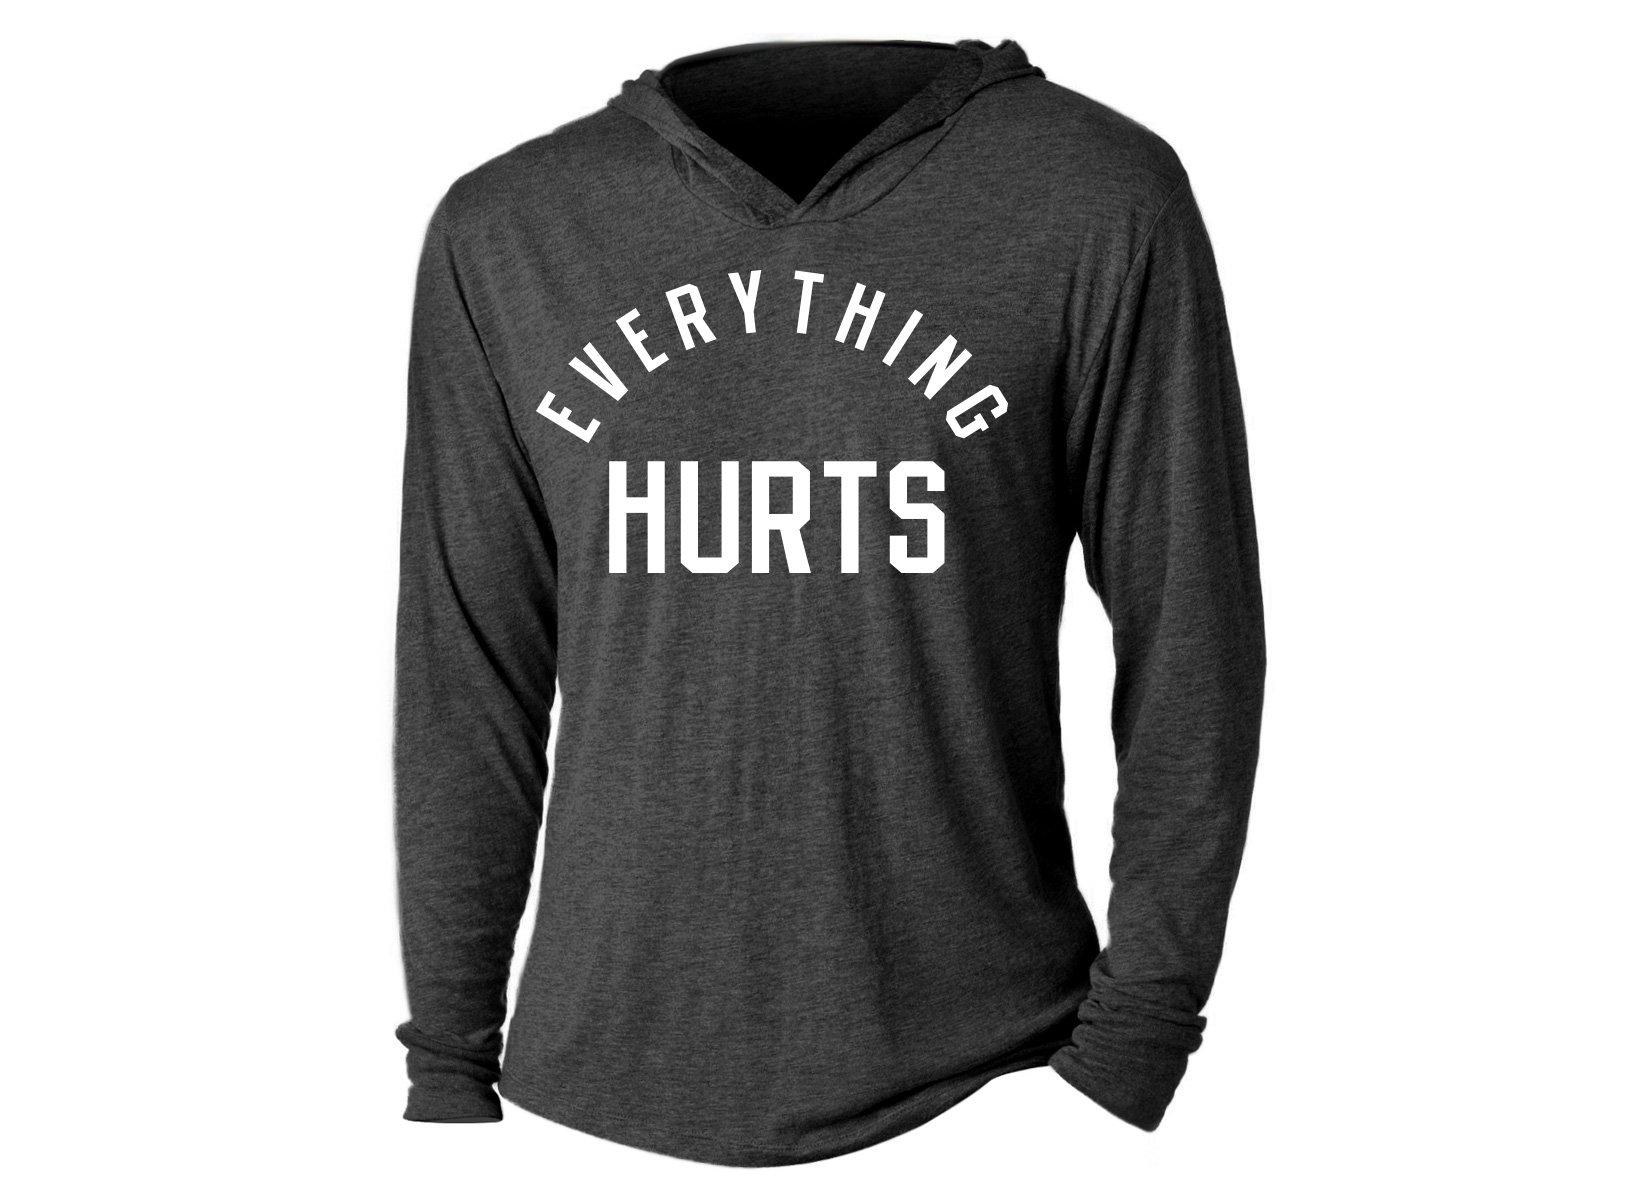 Womens Burnout Shirts